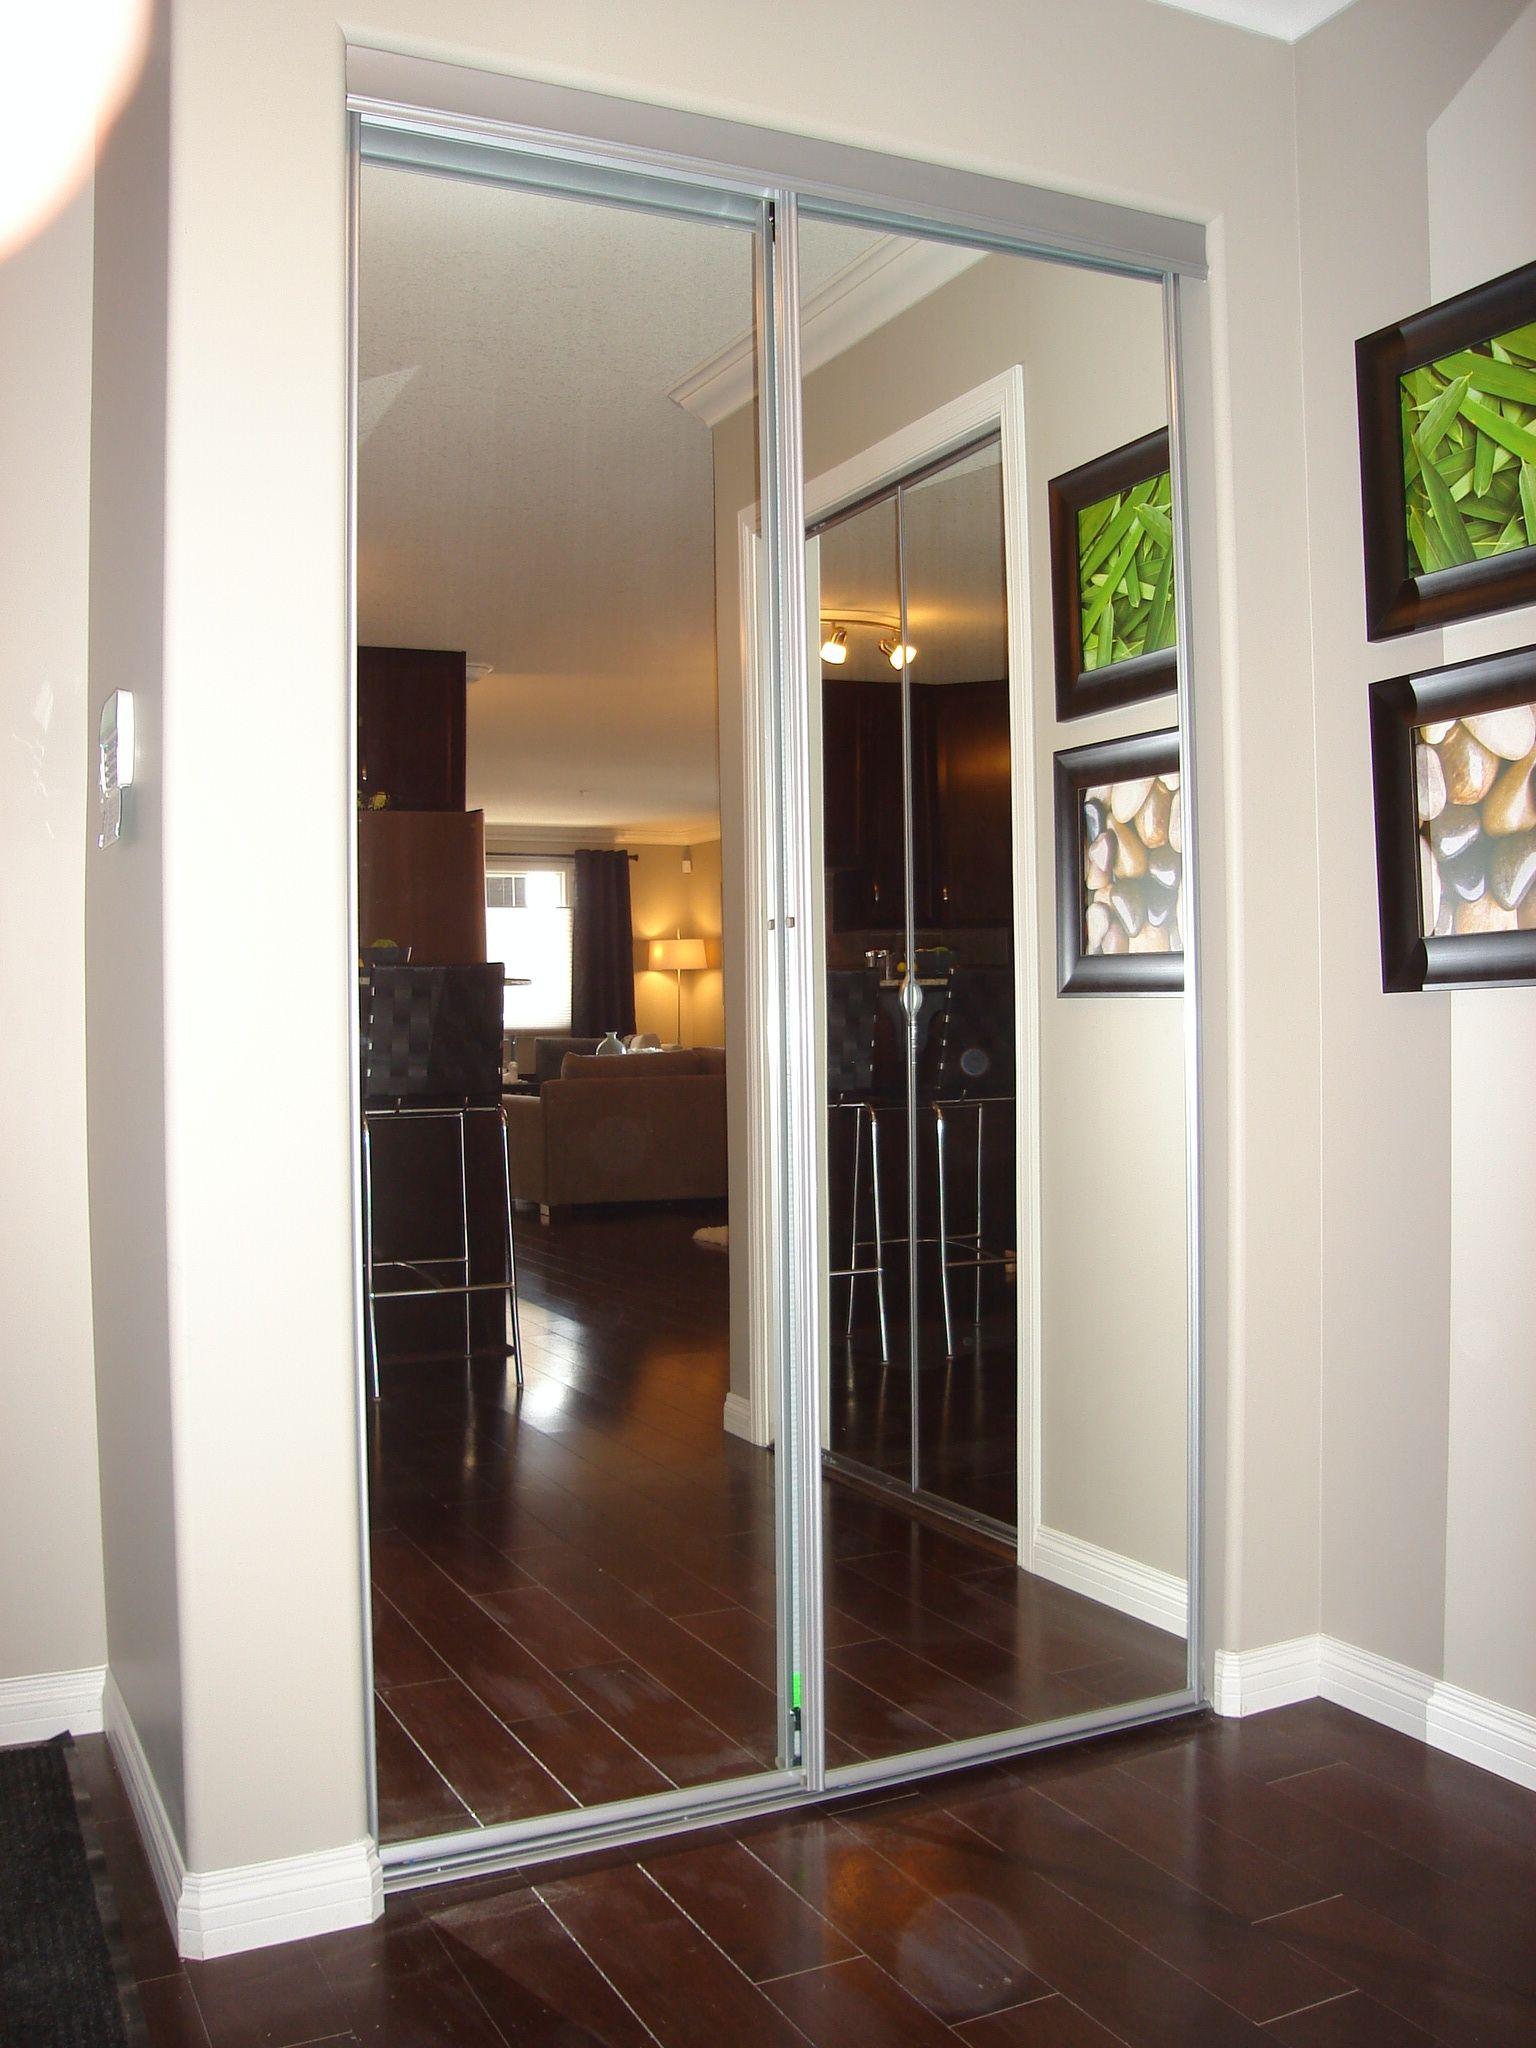 stanley mirrored sliding closet. Stanley Closet Mirror Sliding Doors Mirrored Pinterest